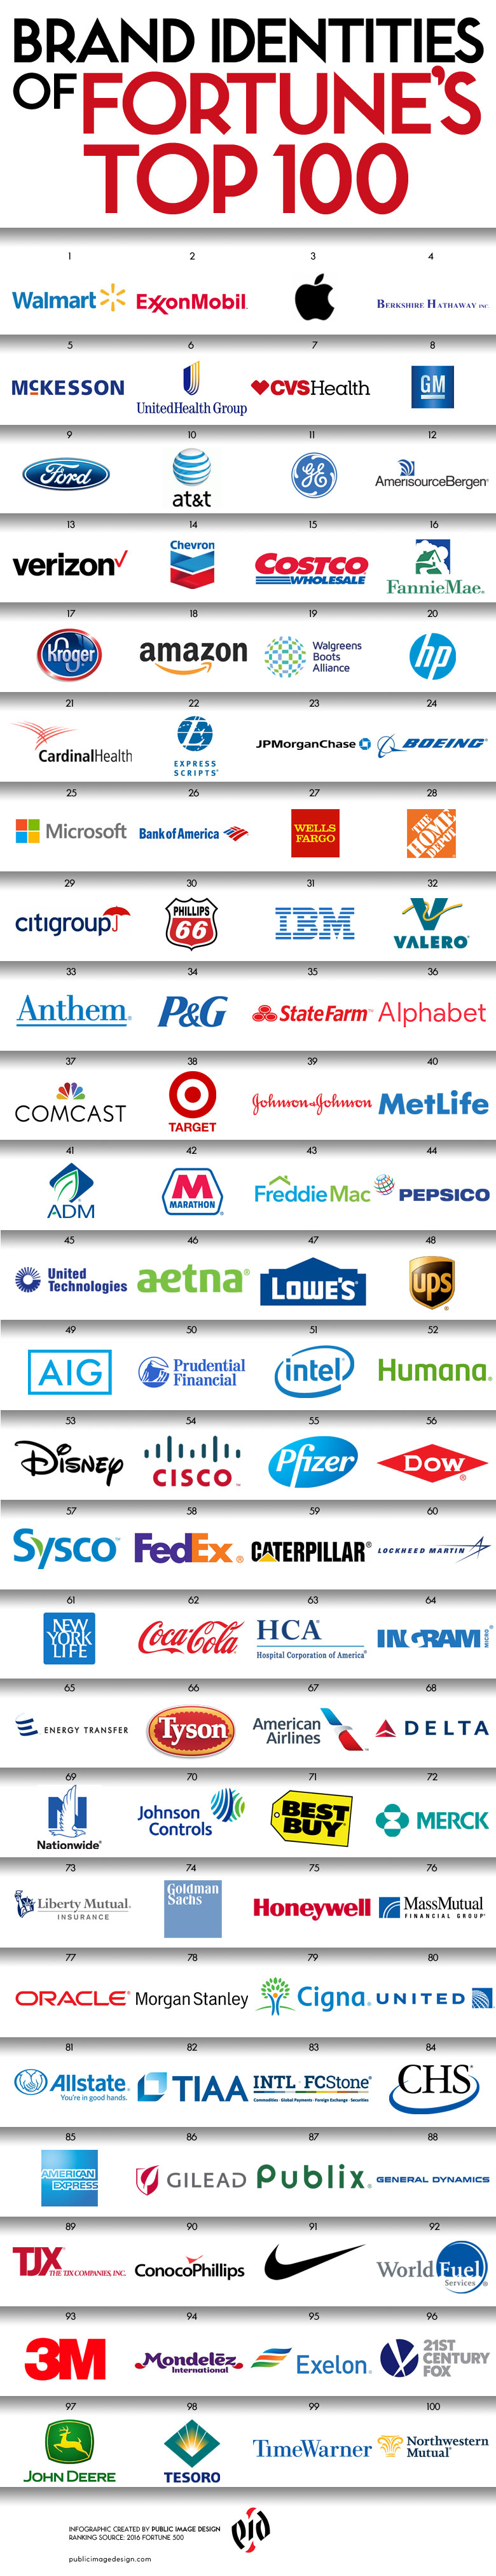 Top-100-Companies-Brand-Identities